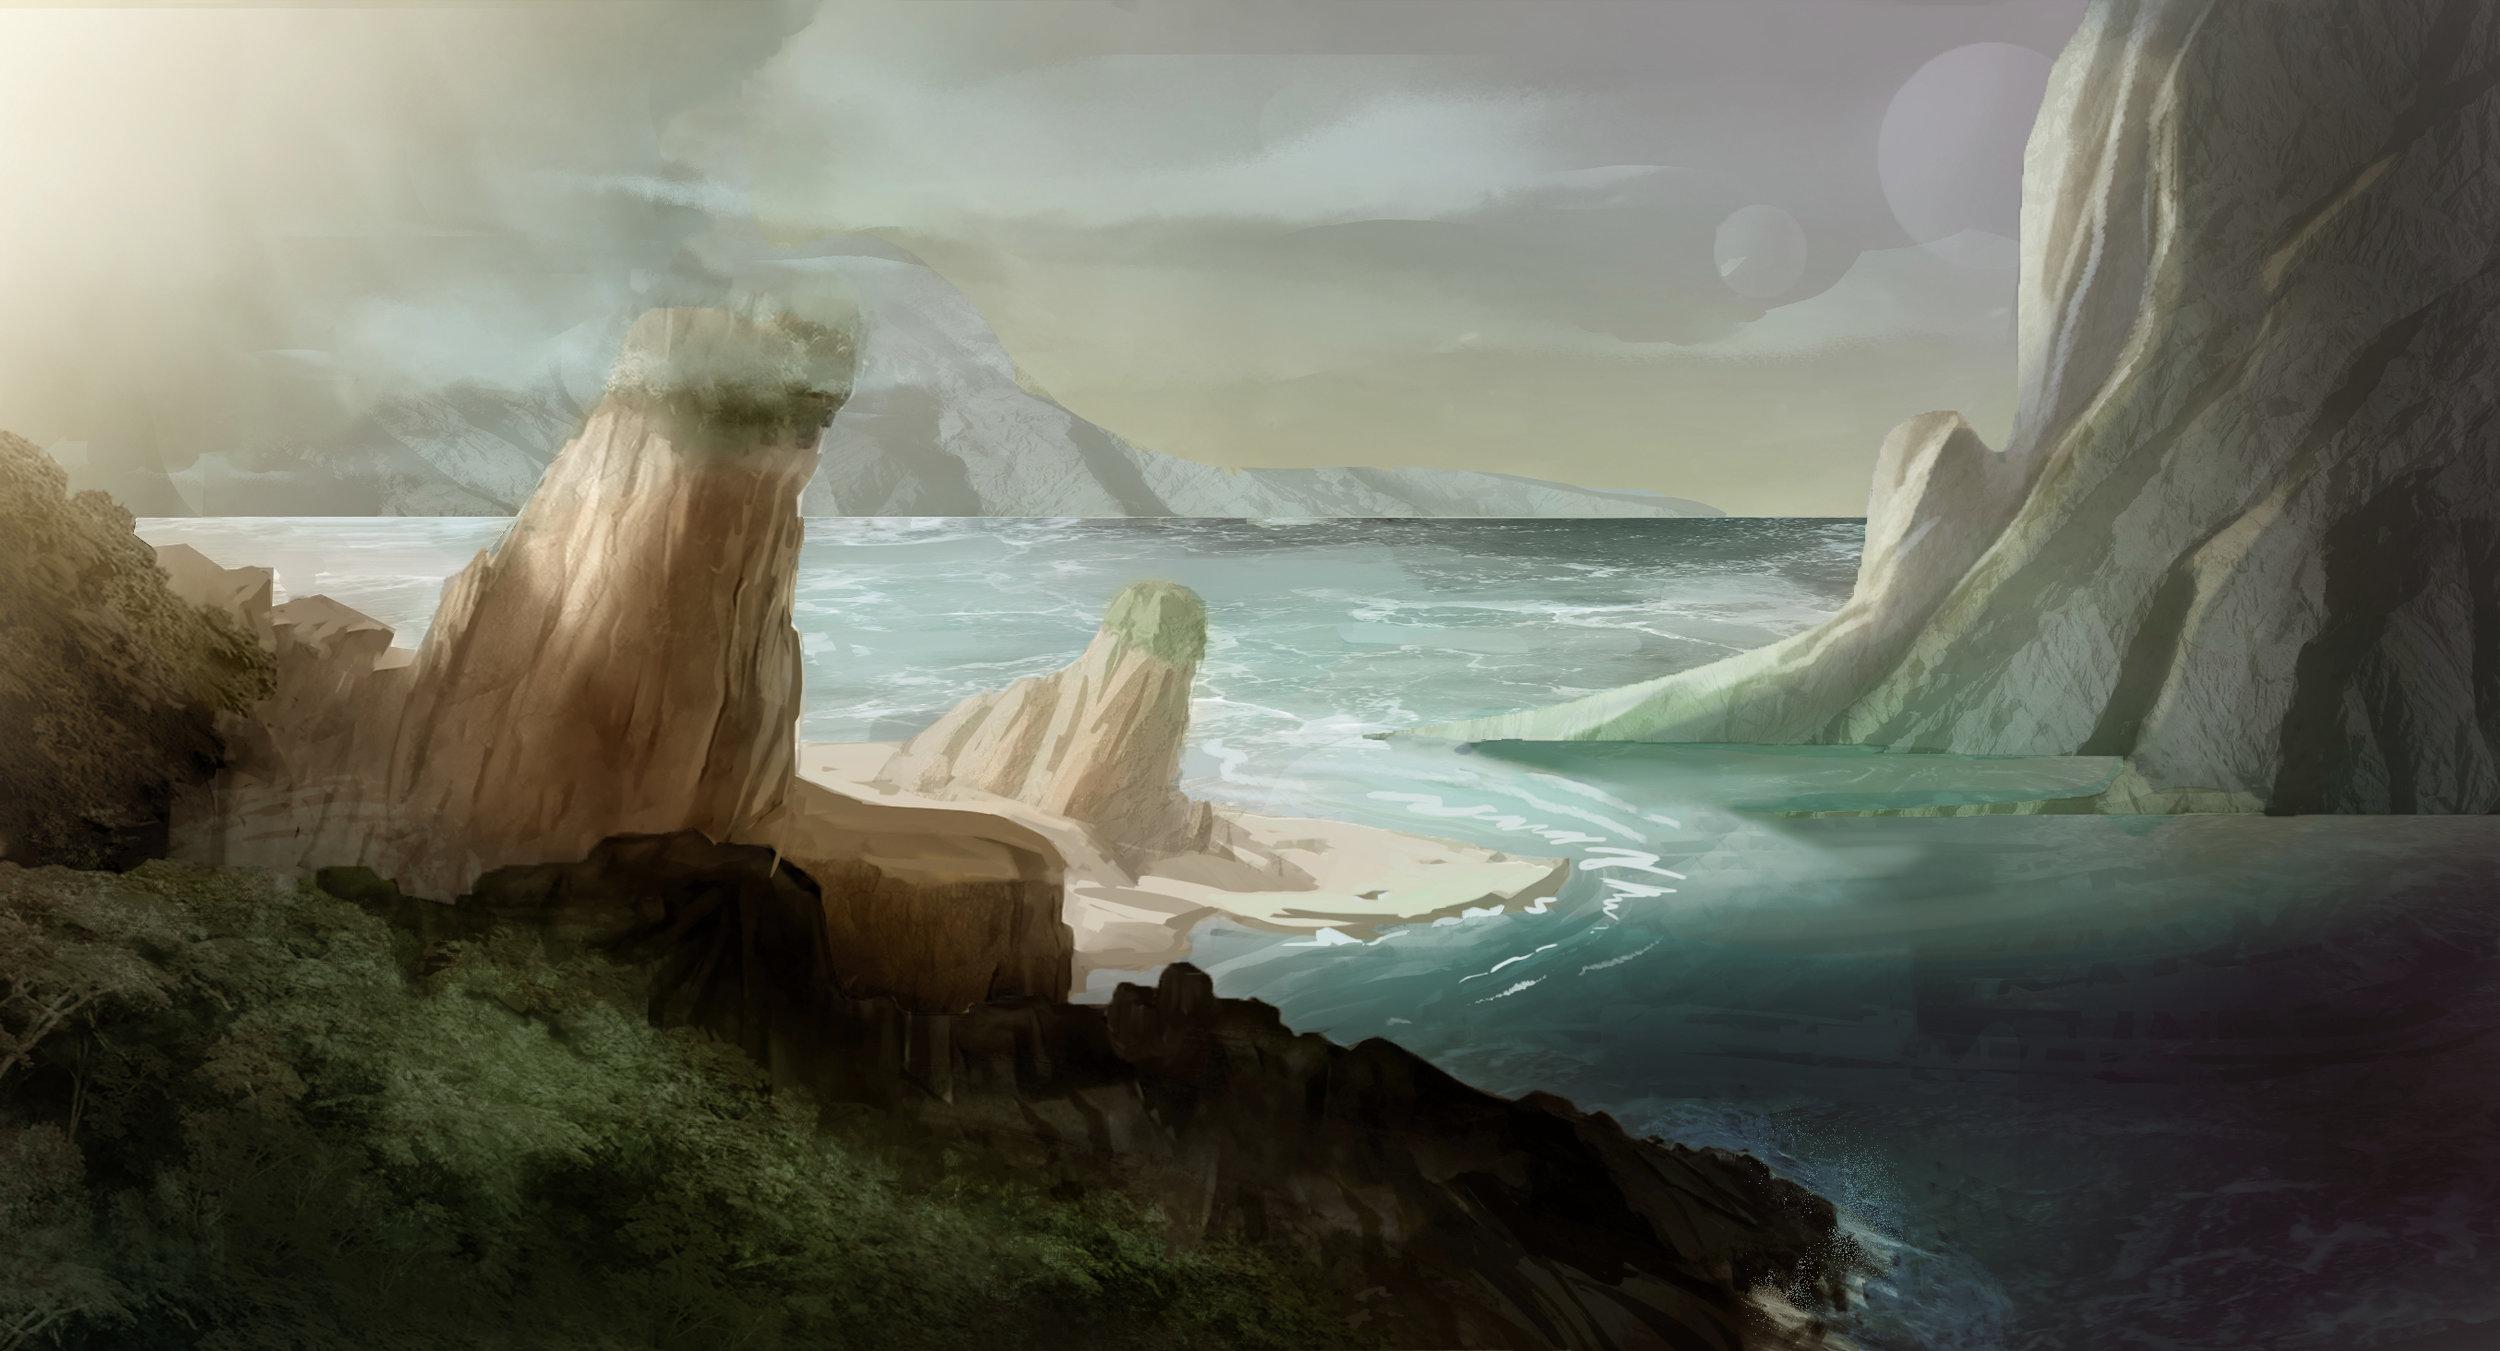 LandscapeAspectRatioColourFinalWEb.jpg